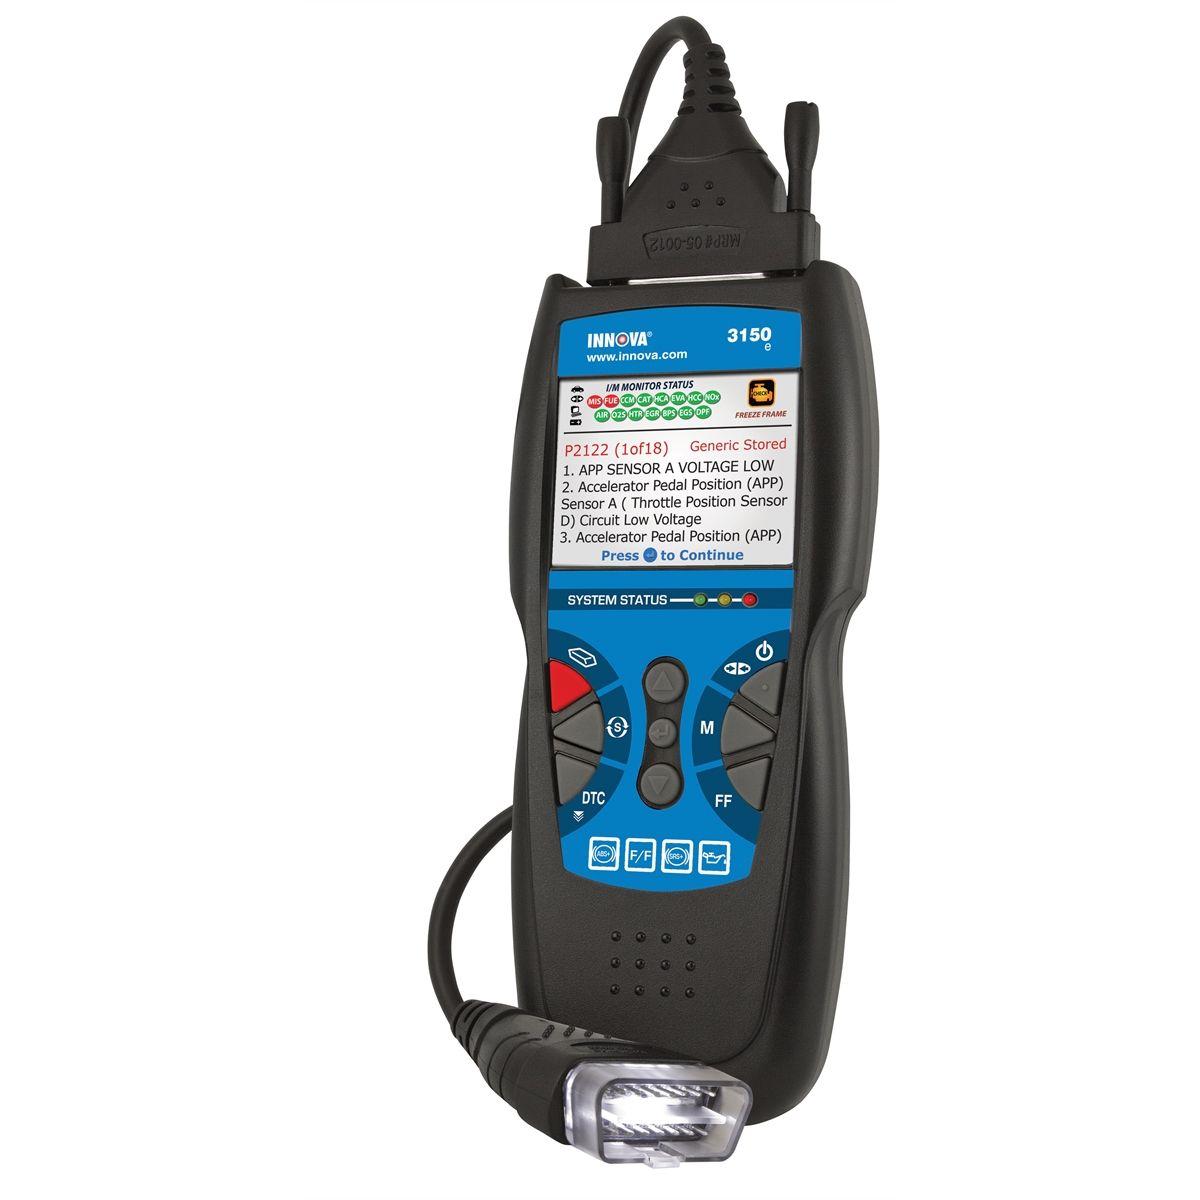 Innova automotive diagnostic tool